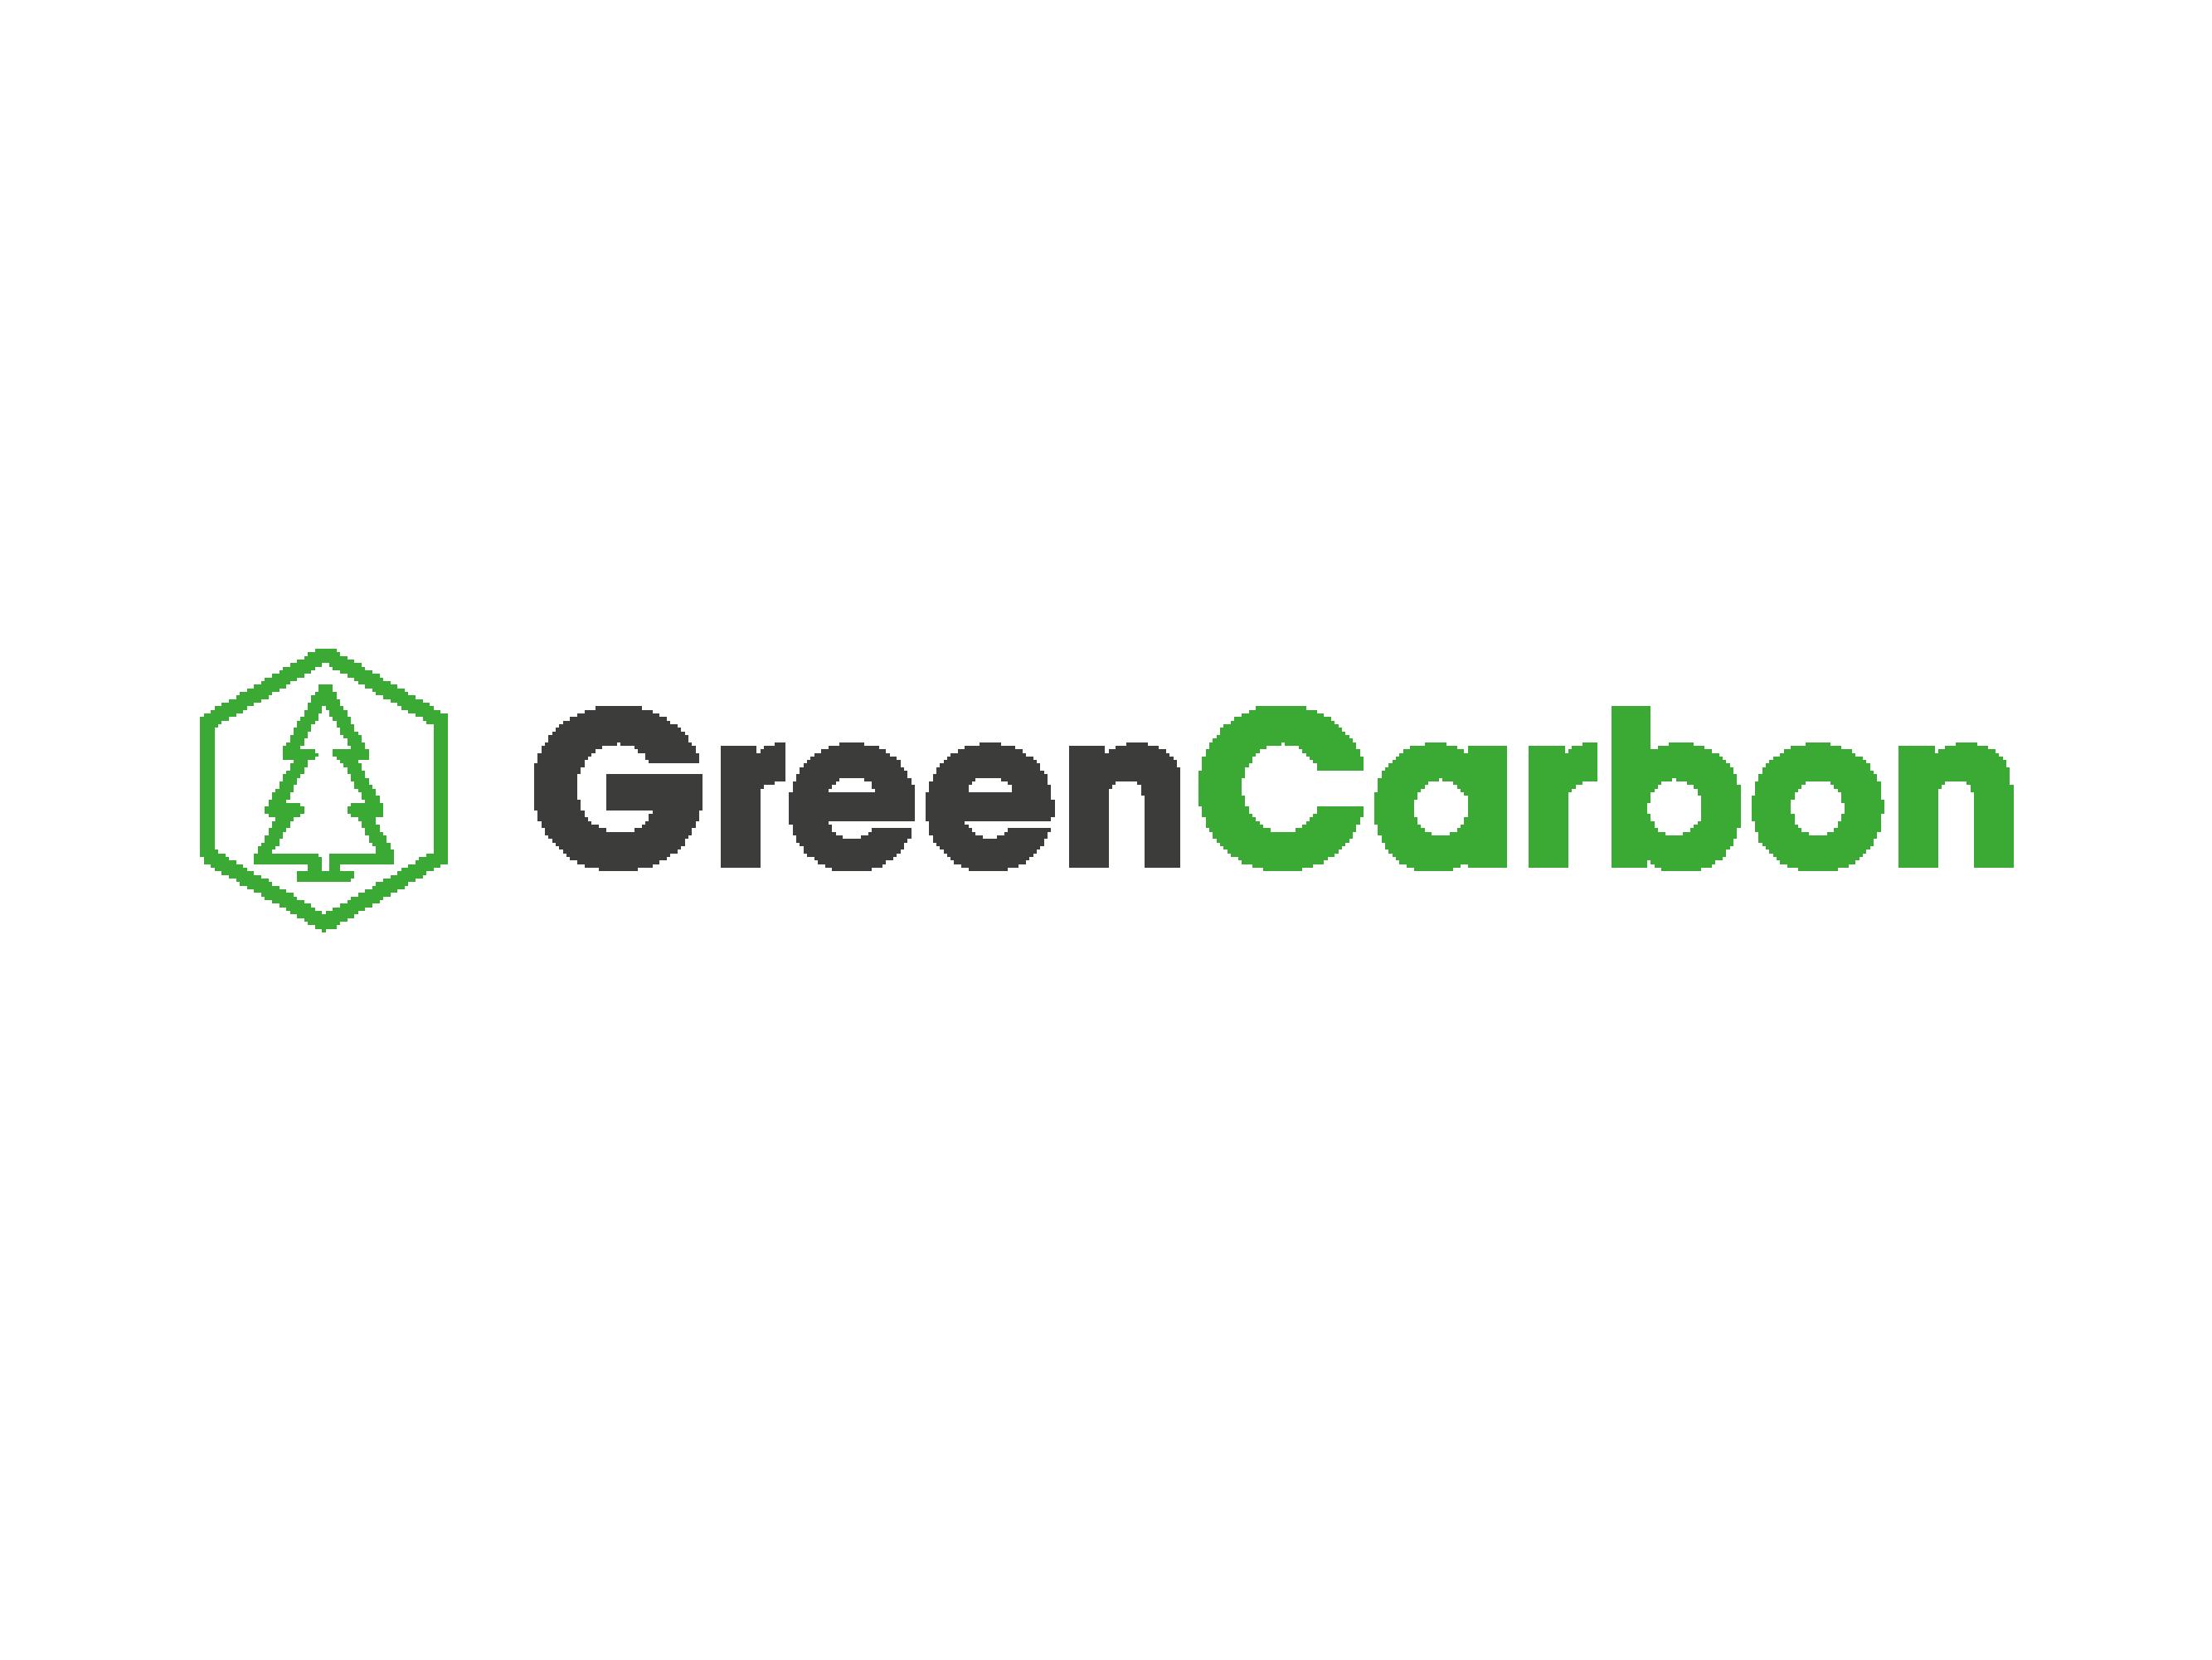 greencarbon1-05